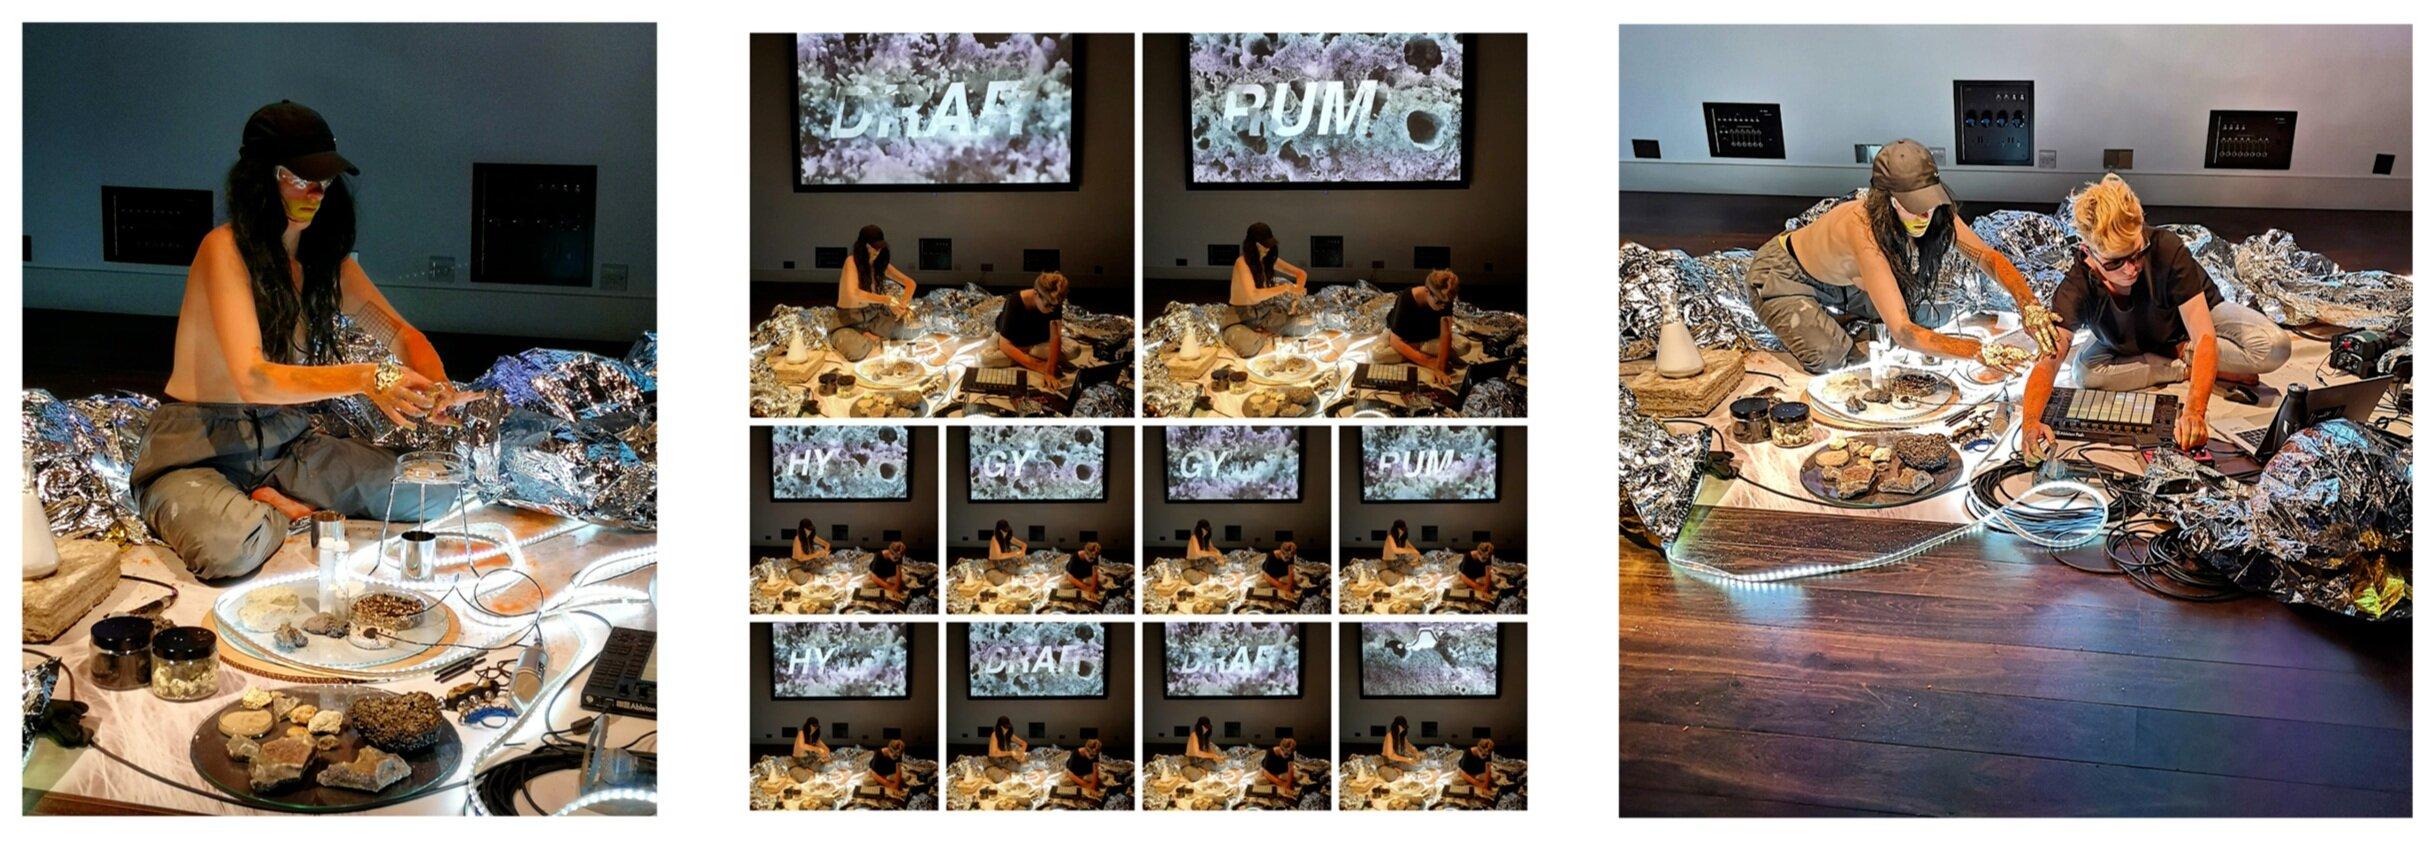 Hg (Mercury)   .  2019. Science Gallery, London. Rachel Pimm and Lori E Allen.  Video, live performance and sound.  Photos by Deborah Wale.